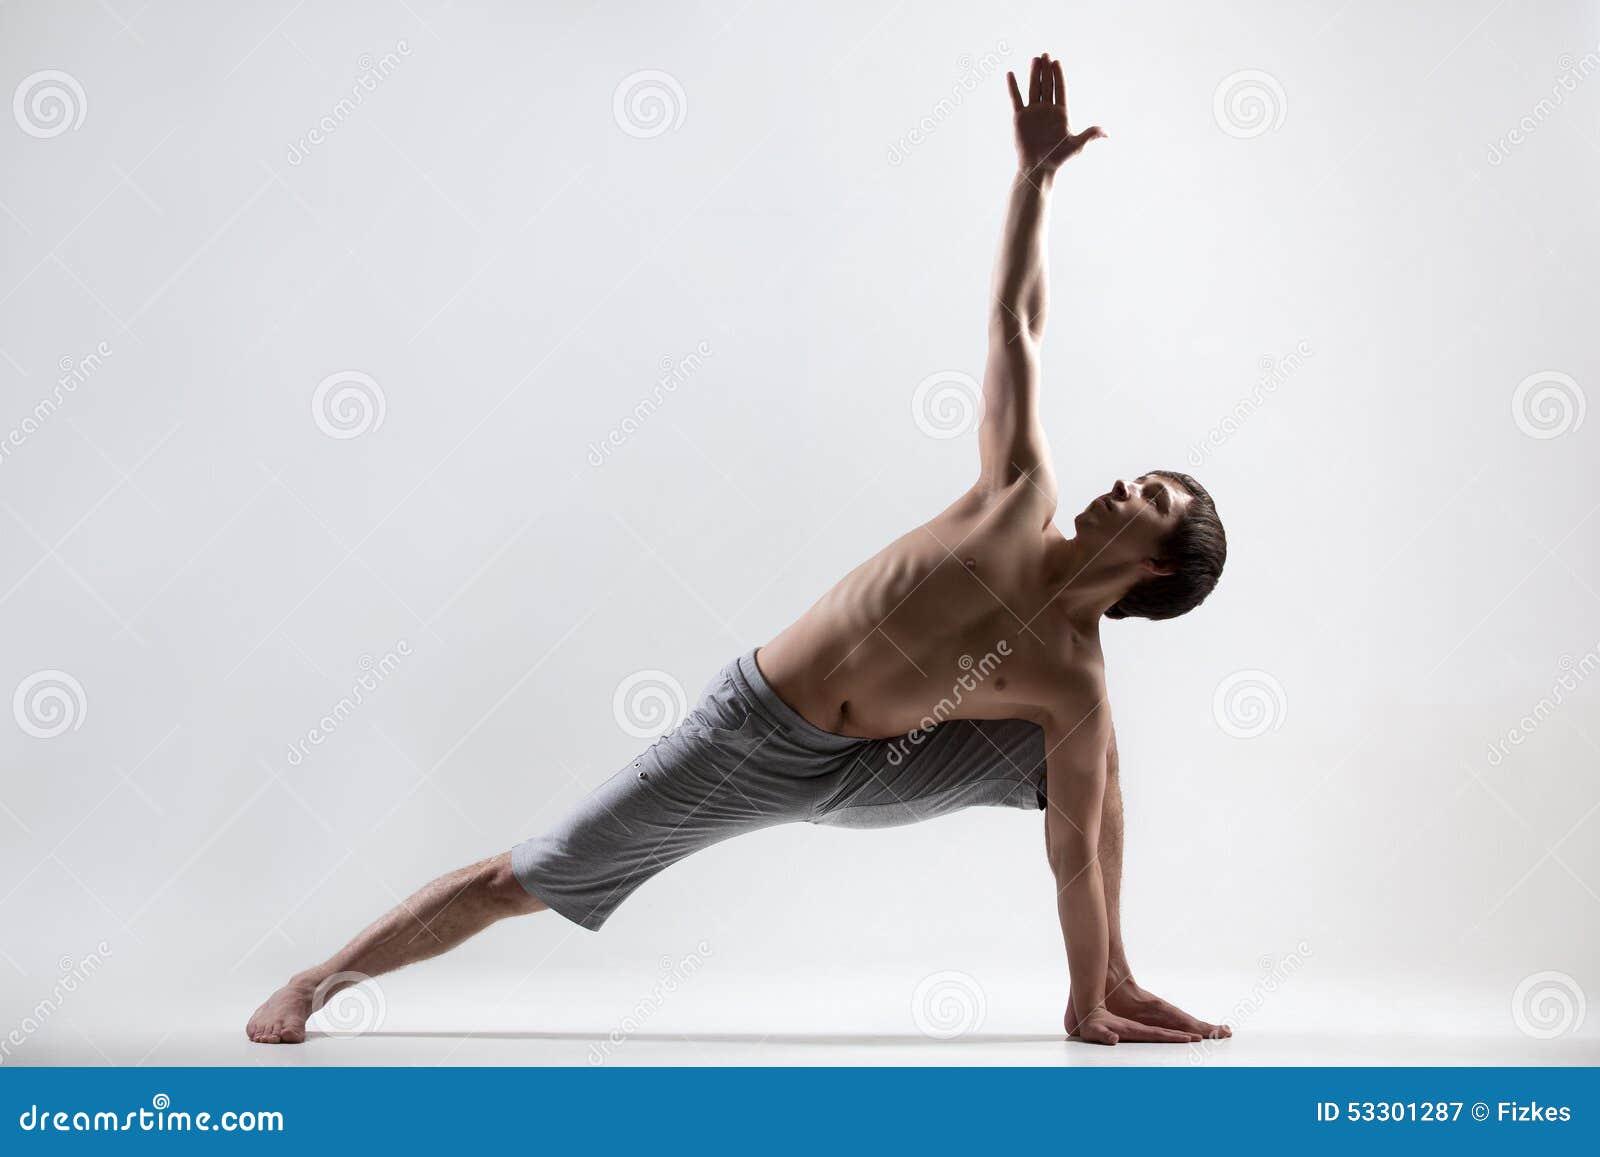 revolved side angle yoga pose stock photo image 53301287